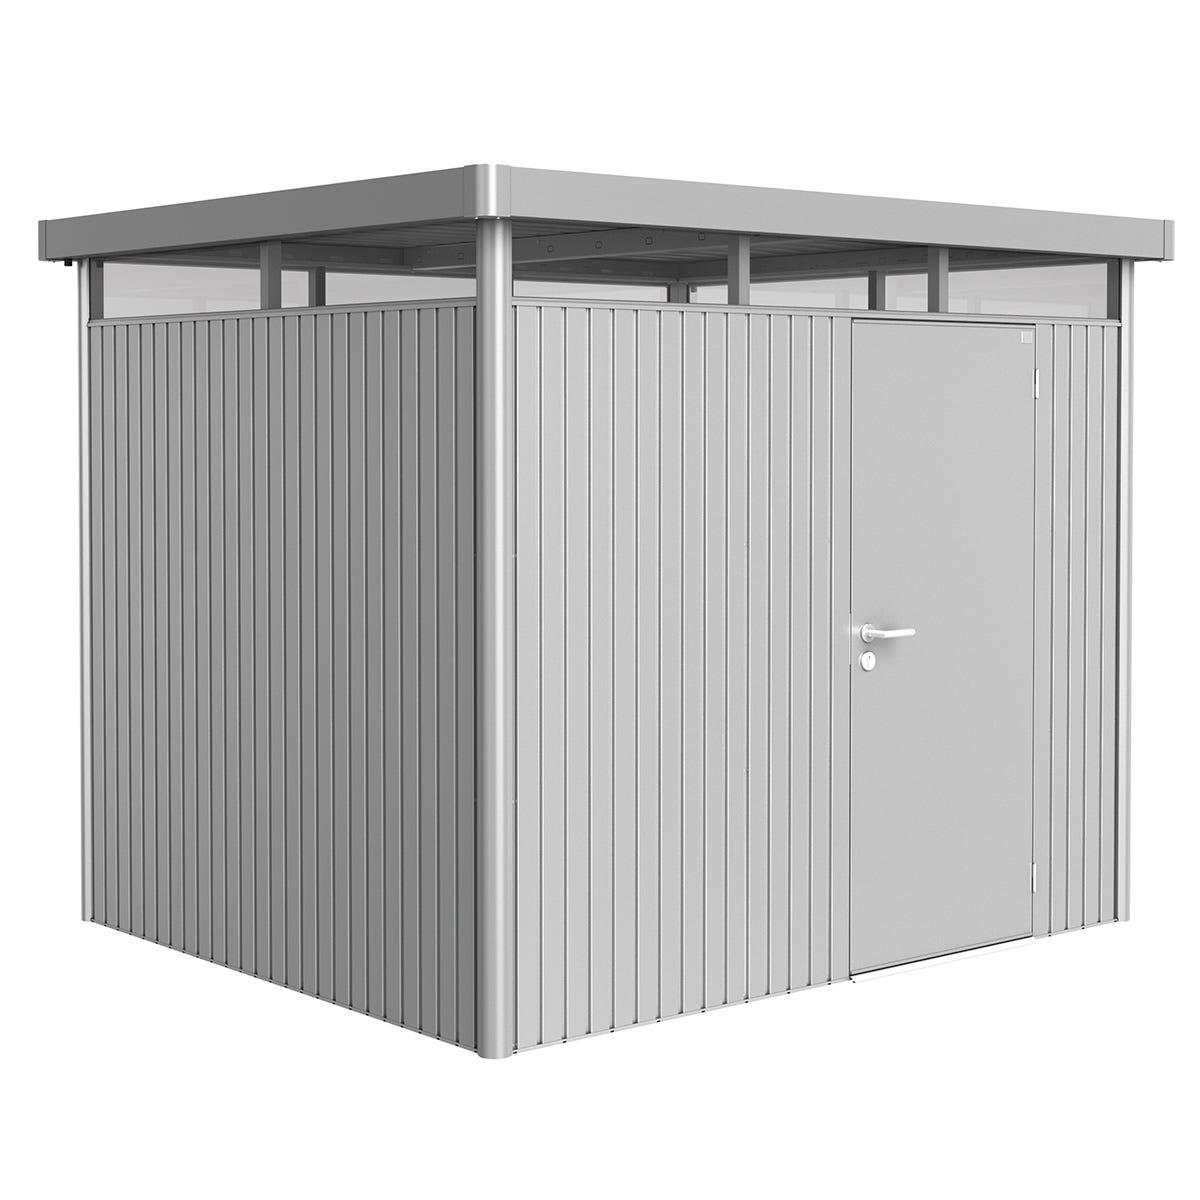 Biohort Highline Metal Shed H3 Standard door 9 x 8 - Metallic Silver